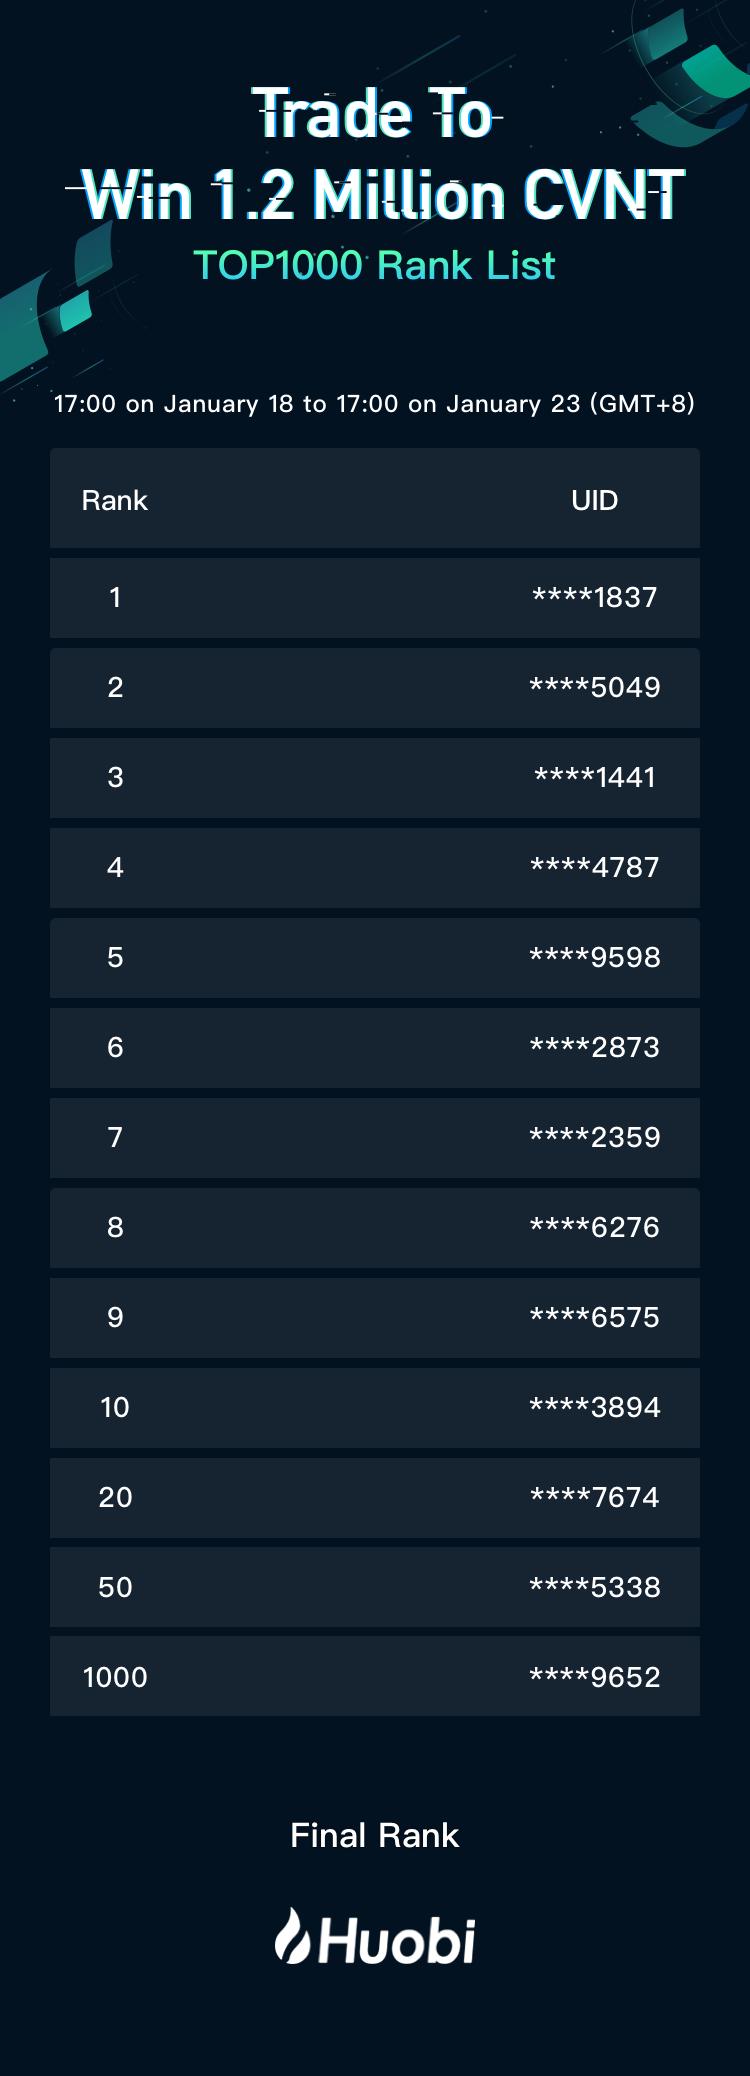 Trade_CVNT_to_Win_1.2_Million_CVNT_APP_CN_Copy_4.png